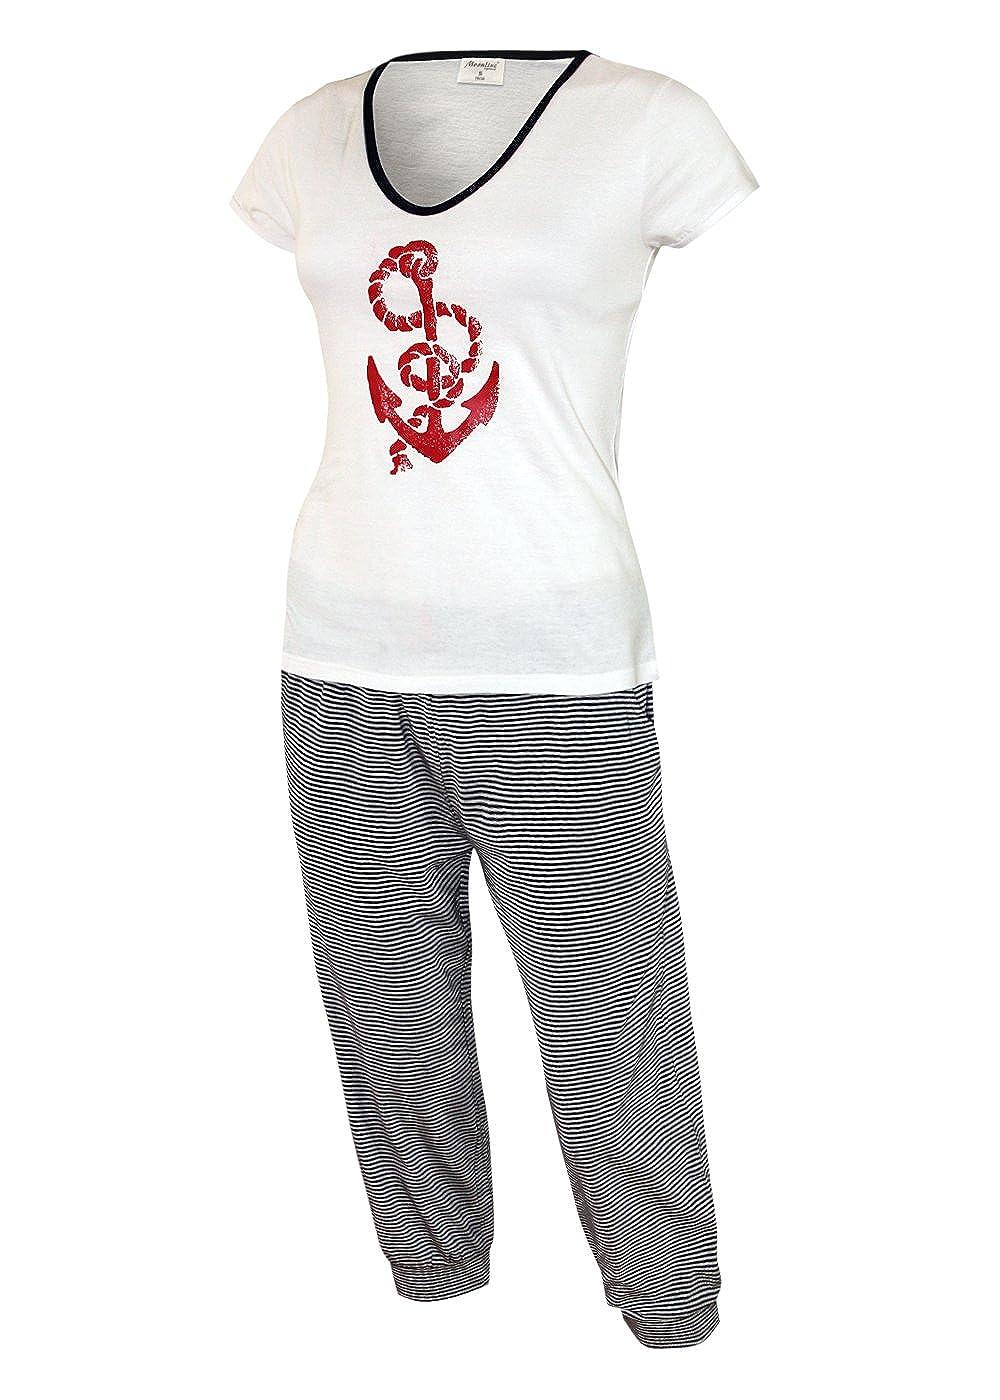 2ba82e3db1ffee Schlafanzug Kurz Caprihose Damen Pyjama Kurz Damen Nachthemd Kurz aus 100%  Baumwolle softweich Gr.